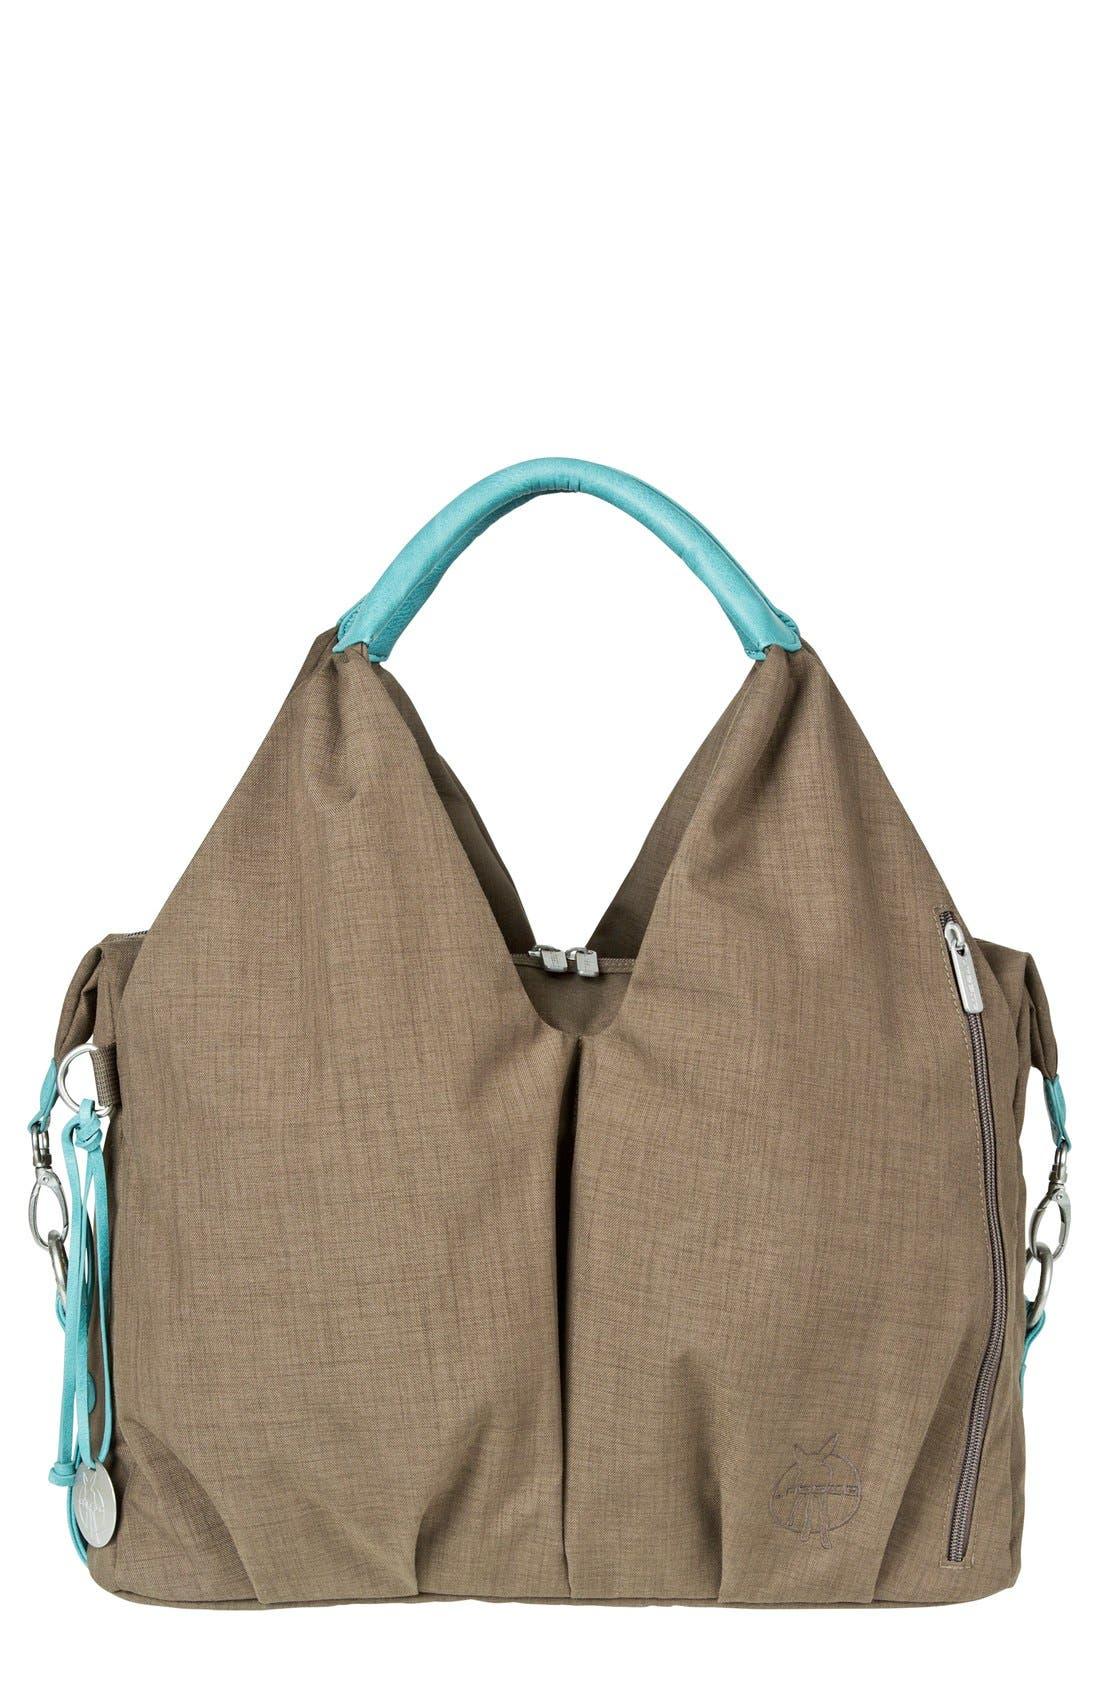 'Green Label - Neckline' Diaper Bag,                         Main,                         color, Teal/ Brown